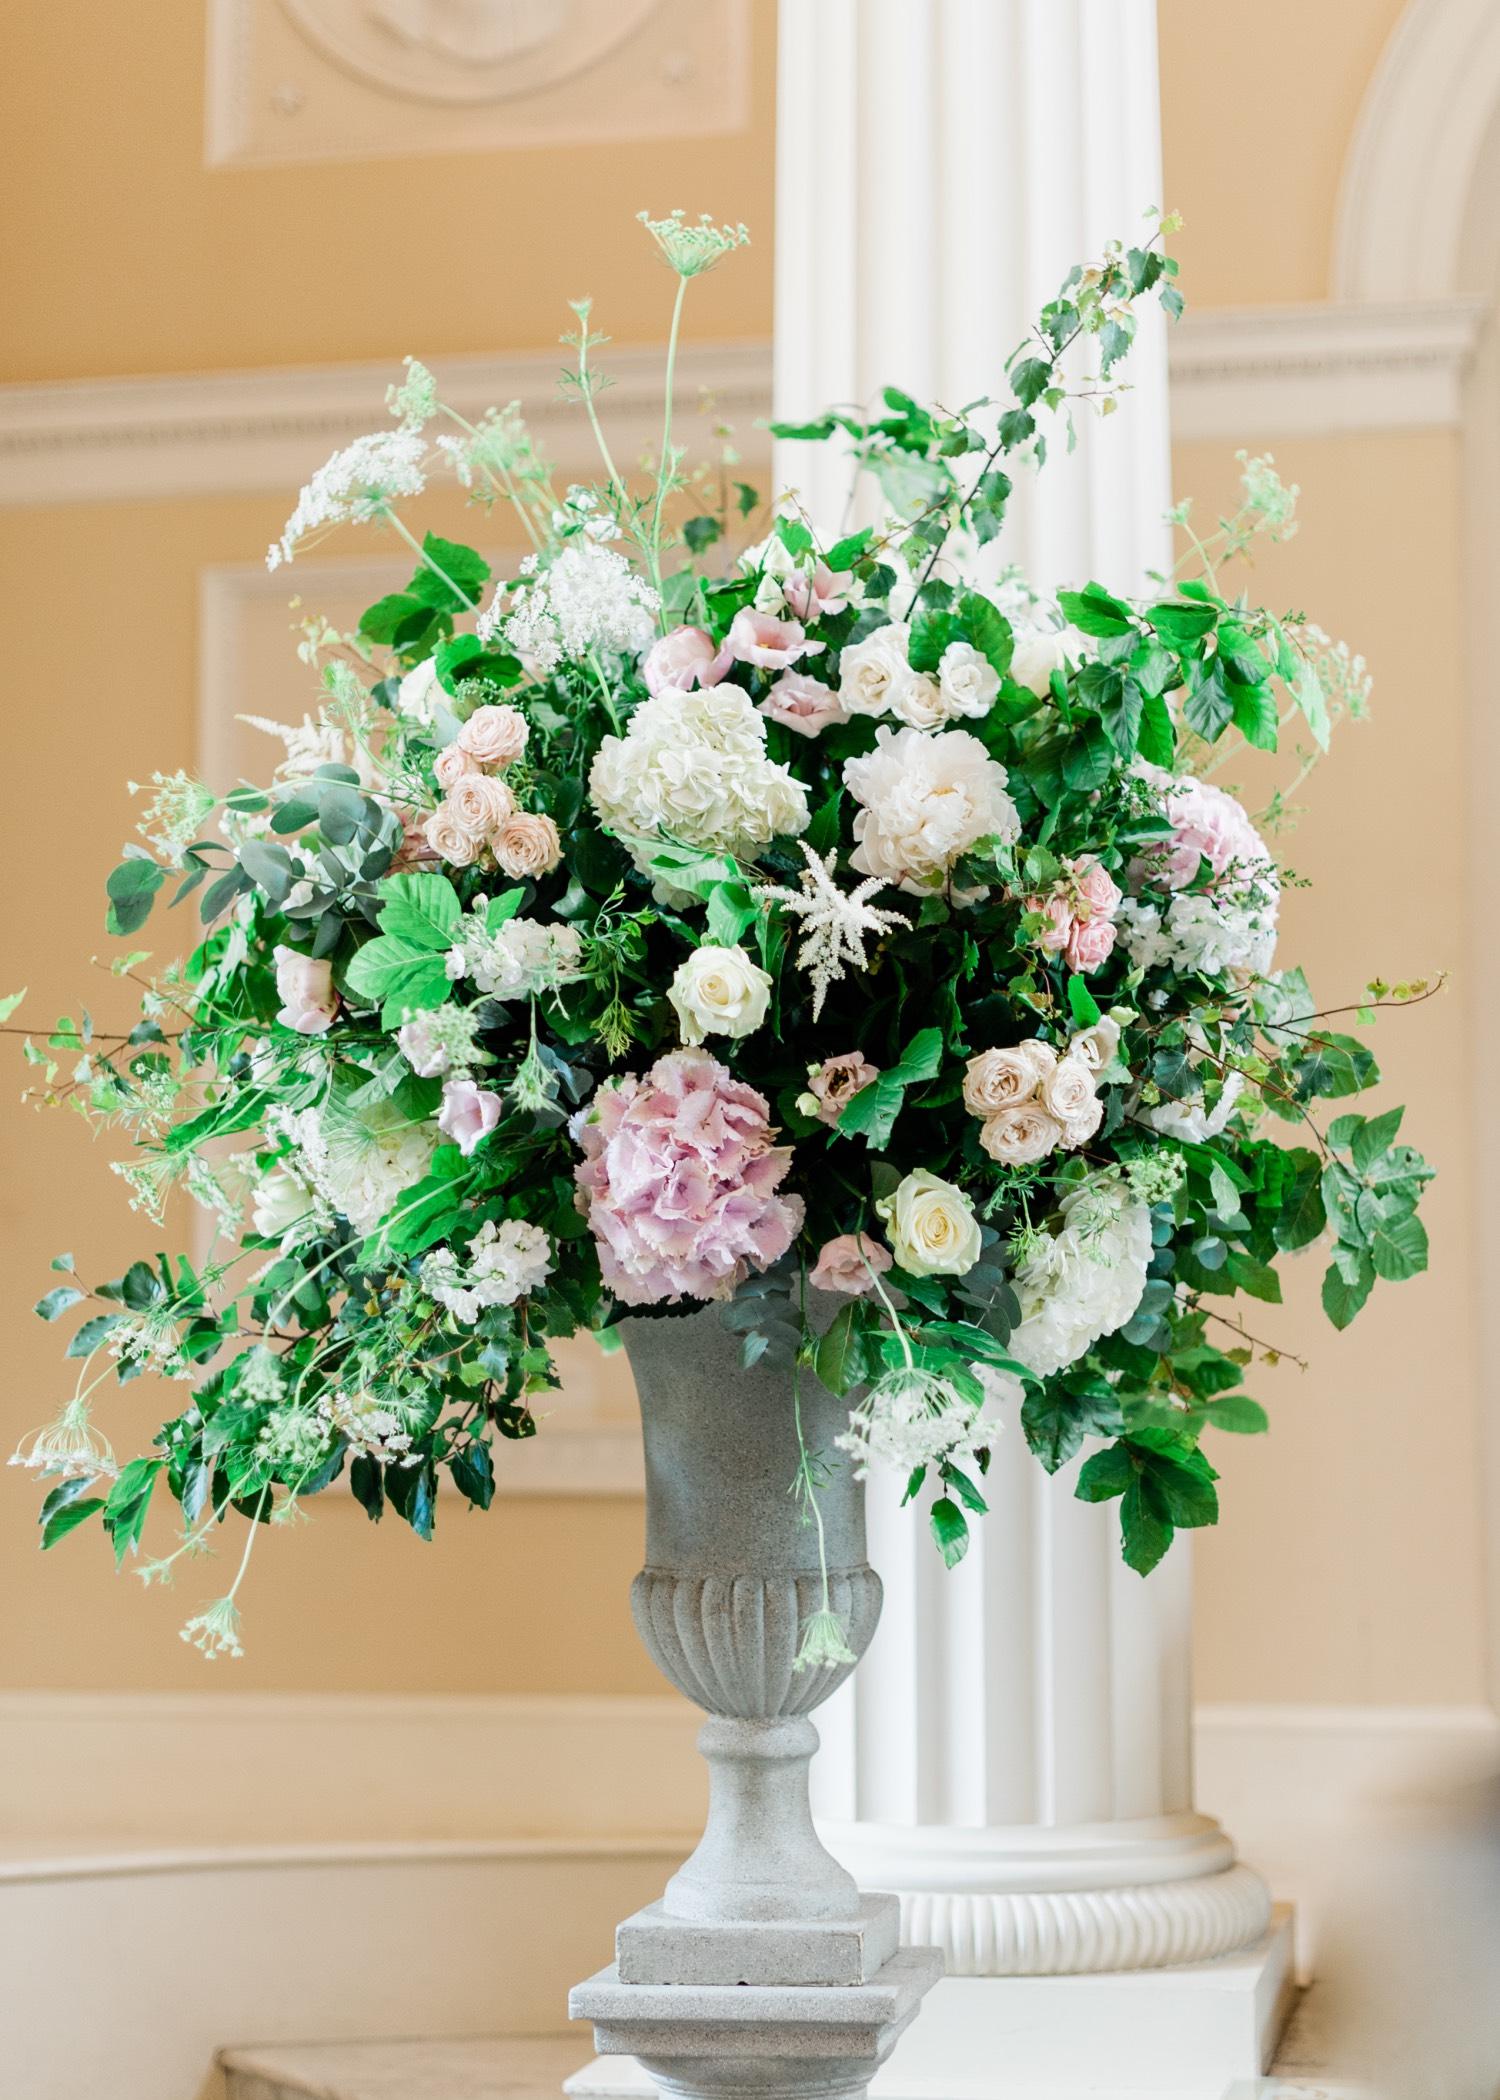 Littleton-Rose-Syon-House-London-Wedding-Planner-Church-flowers.jpg